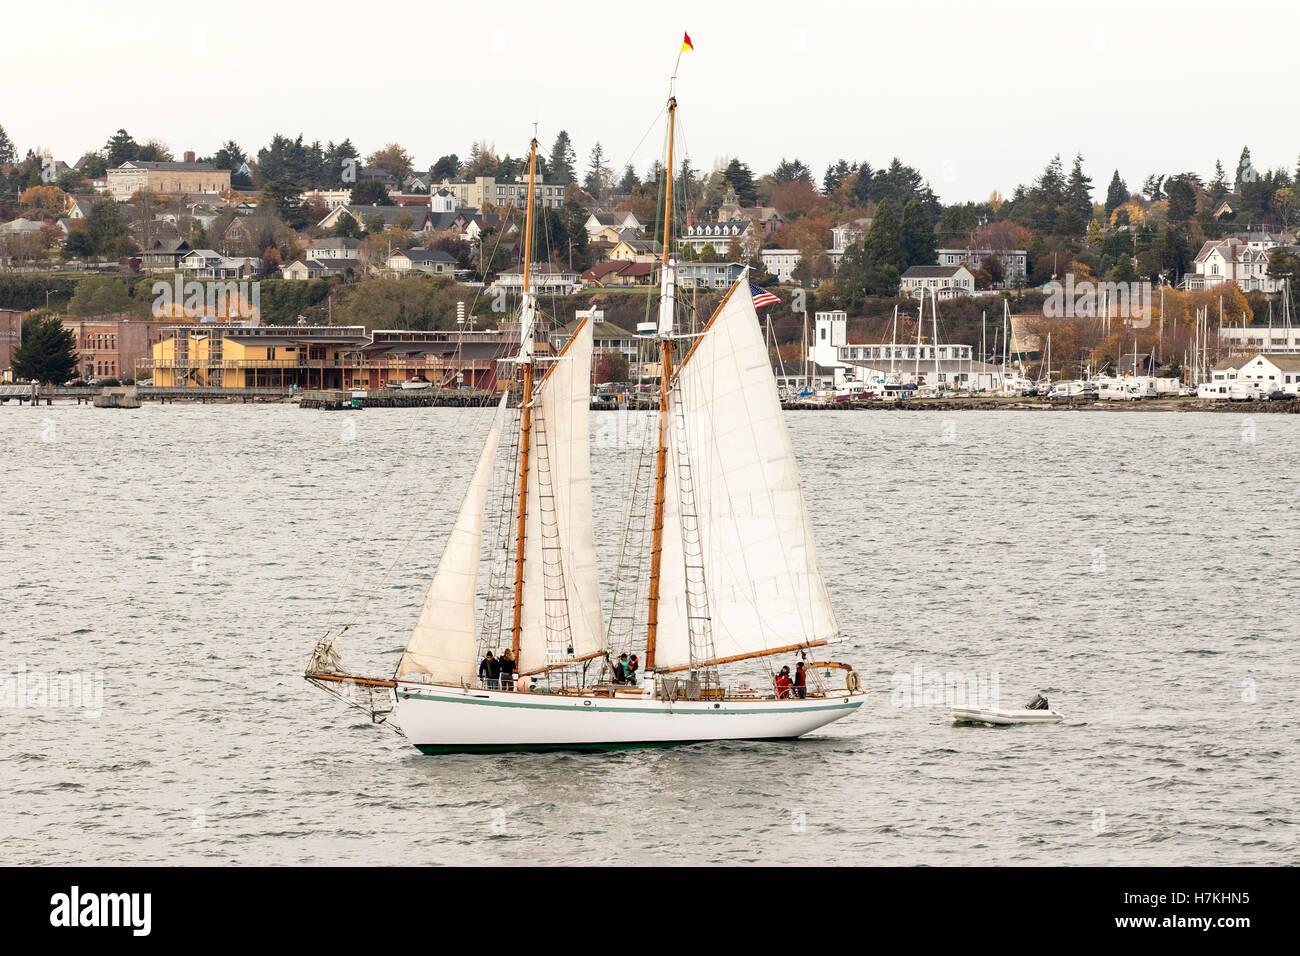 Sailing boat, sailboat wooden schooner yacht on Port Townsend Bay, Puget Sound, Washington with Northwest Maritime - Stock Image